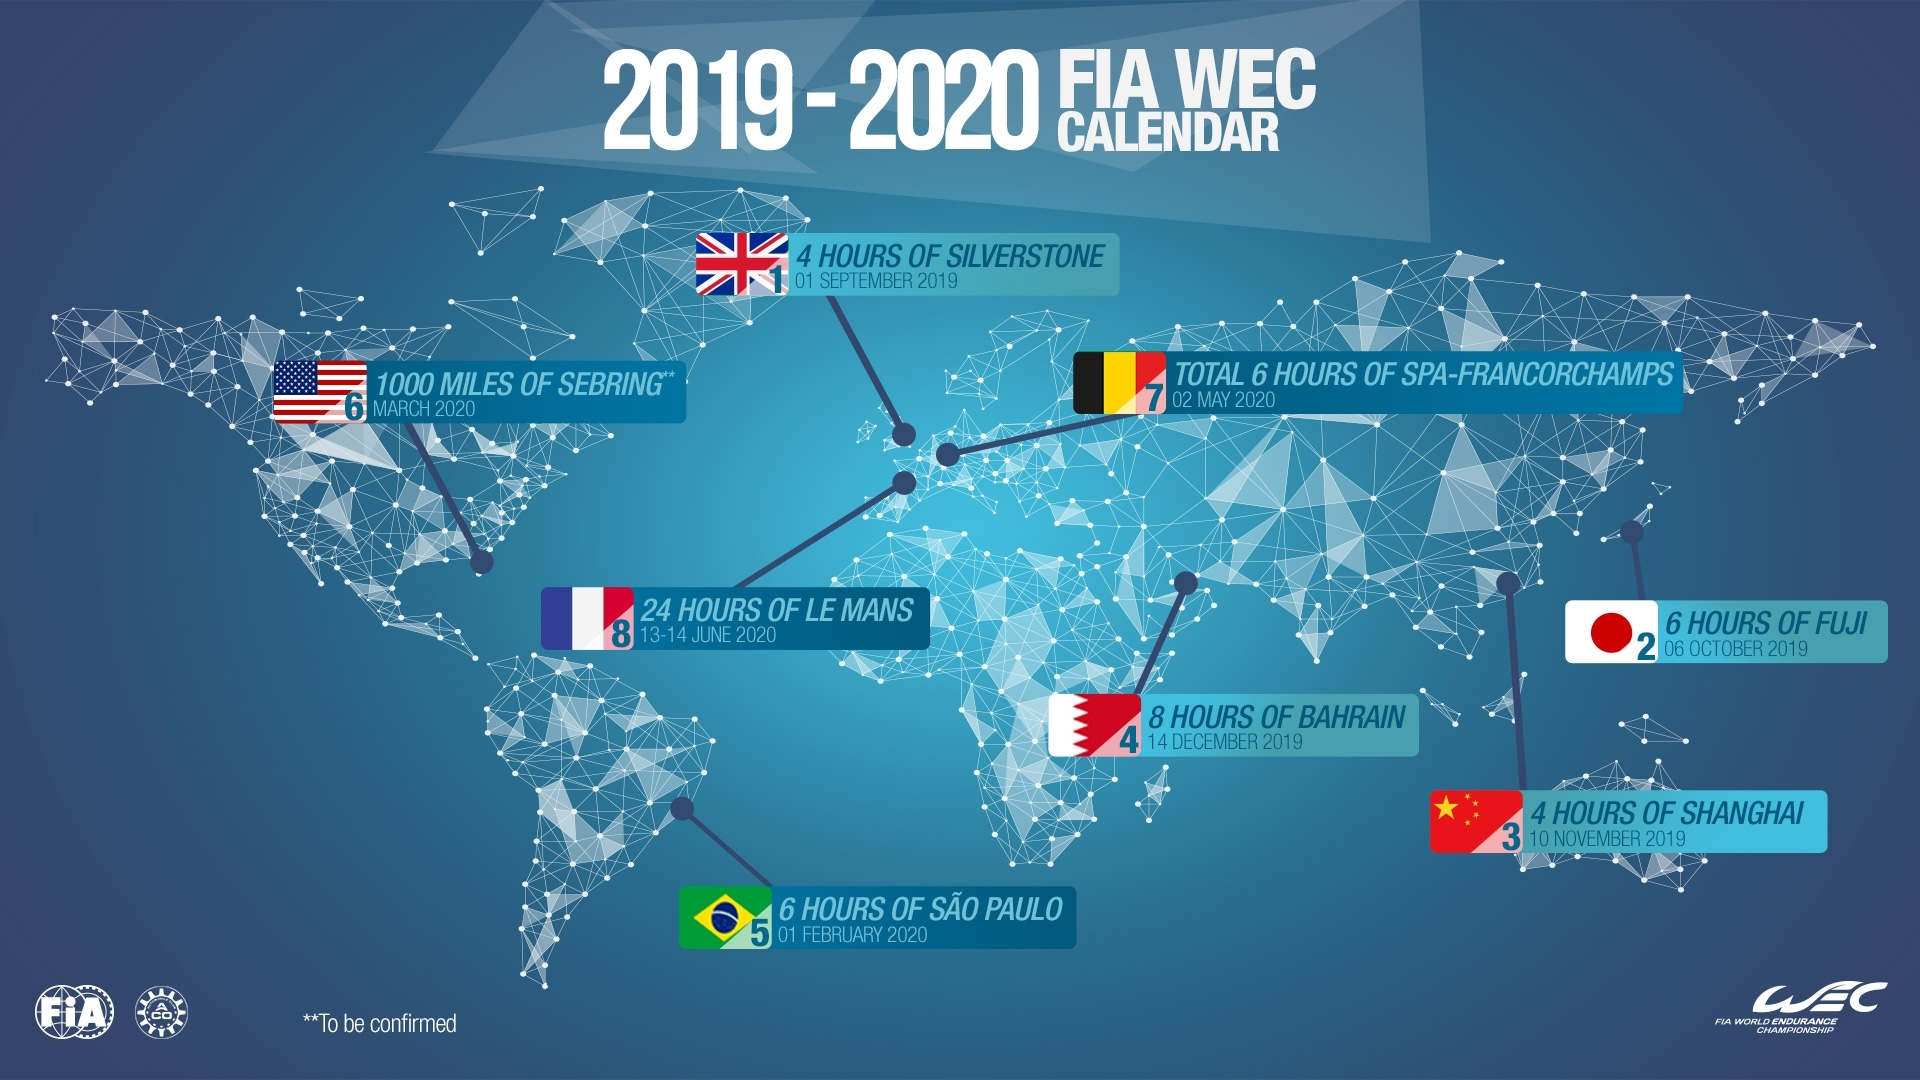 F1 Calendar. Formula 1 Calendar 2019. 2019-09-30